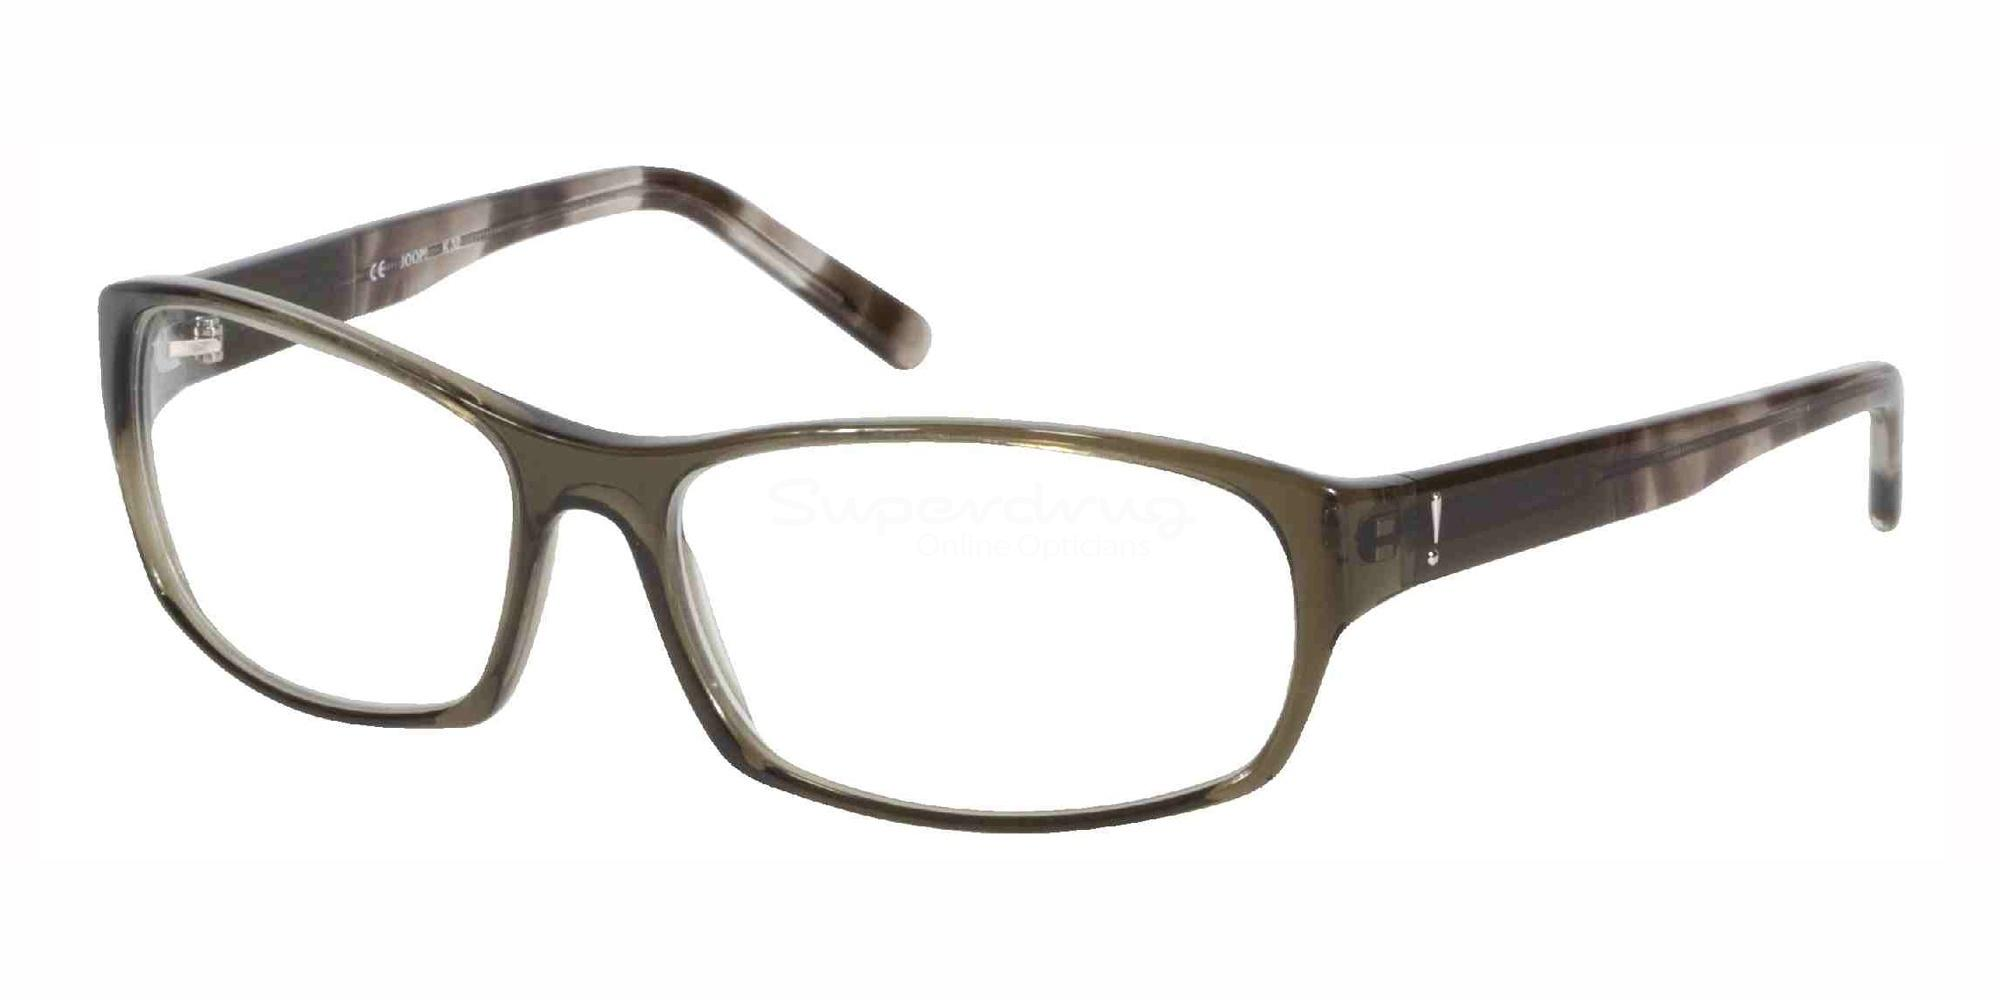 6286 81047 , JOOP Eyewear